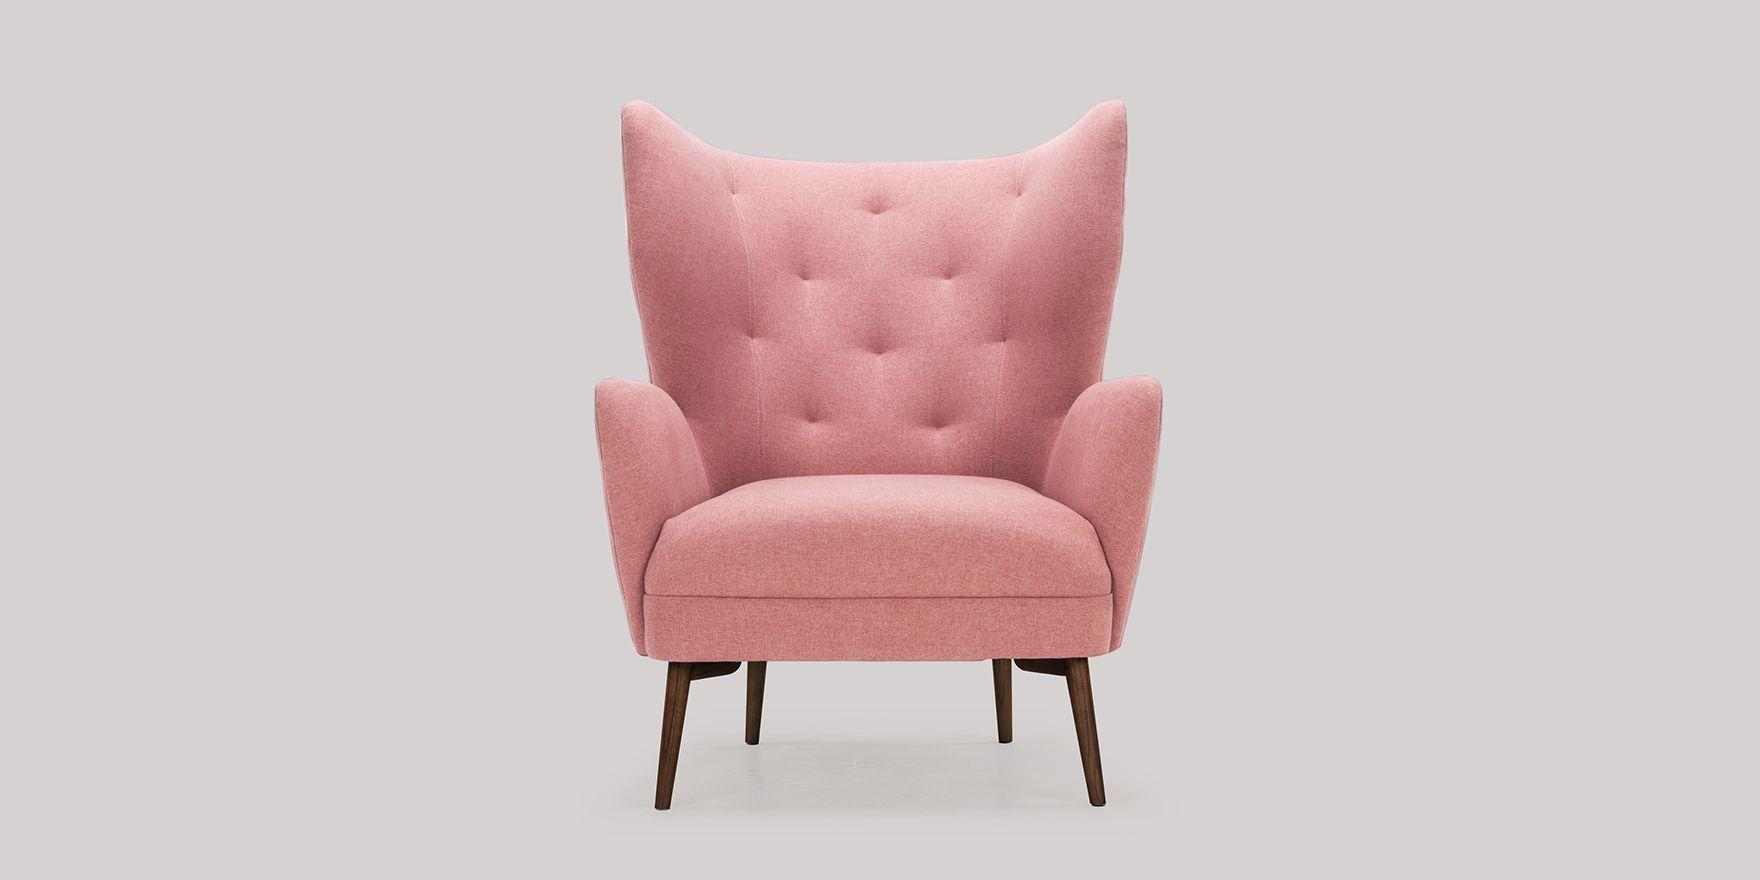 Vivi Fauteuil Prachtige Roze Oorfauteuil Sofacompany Oorfauteuil Stoelen Interieur